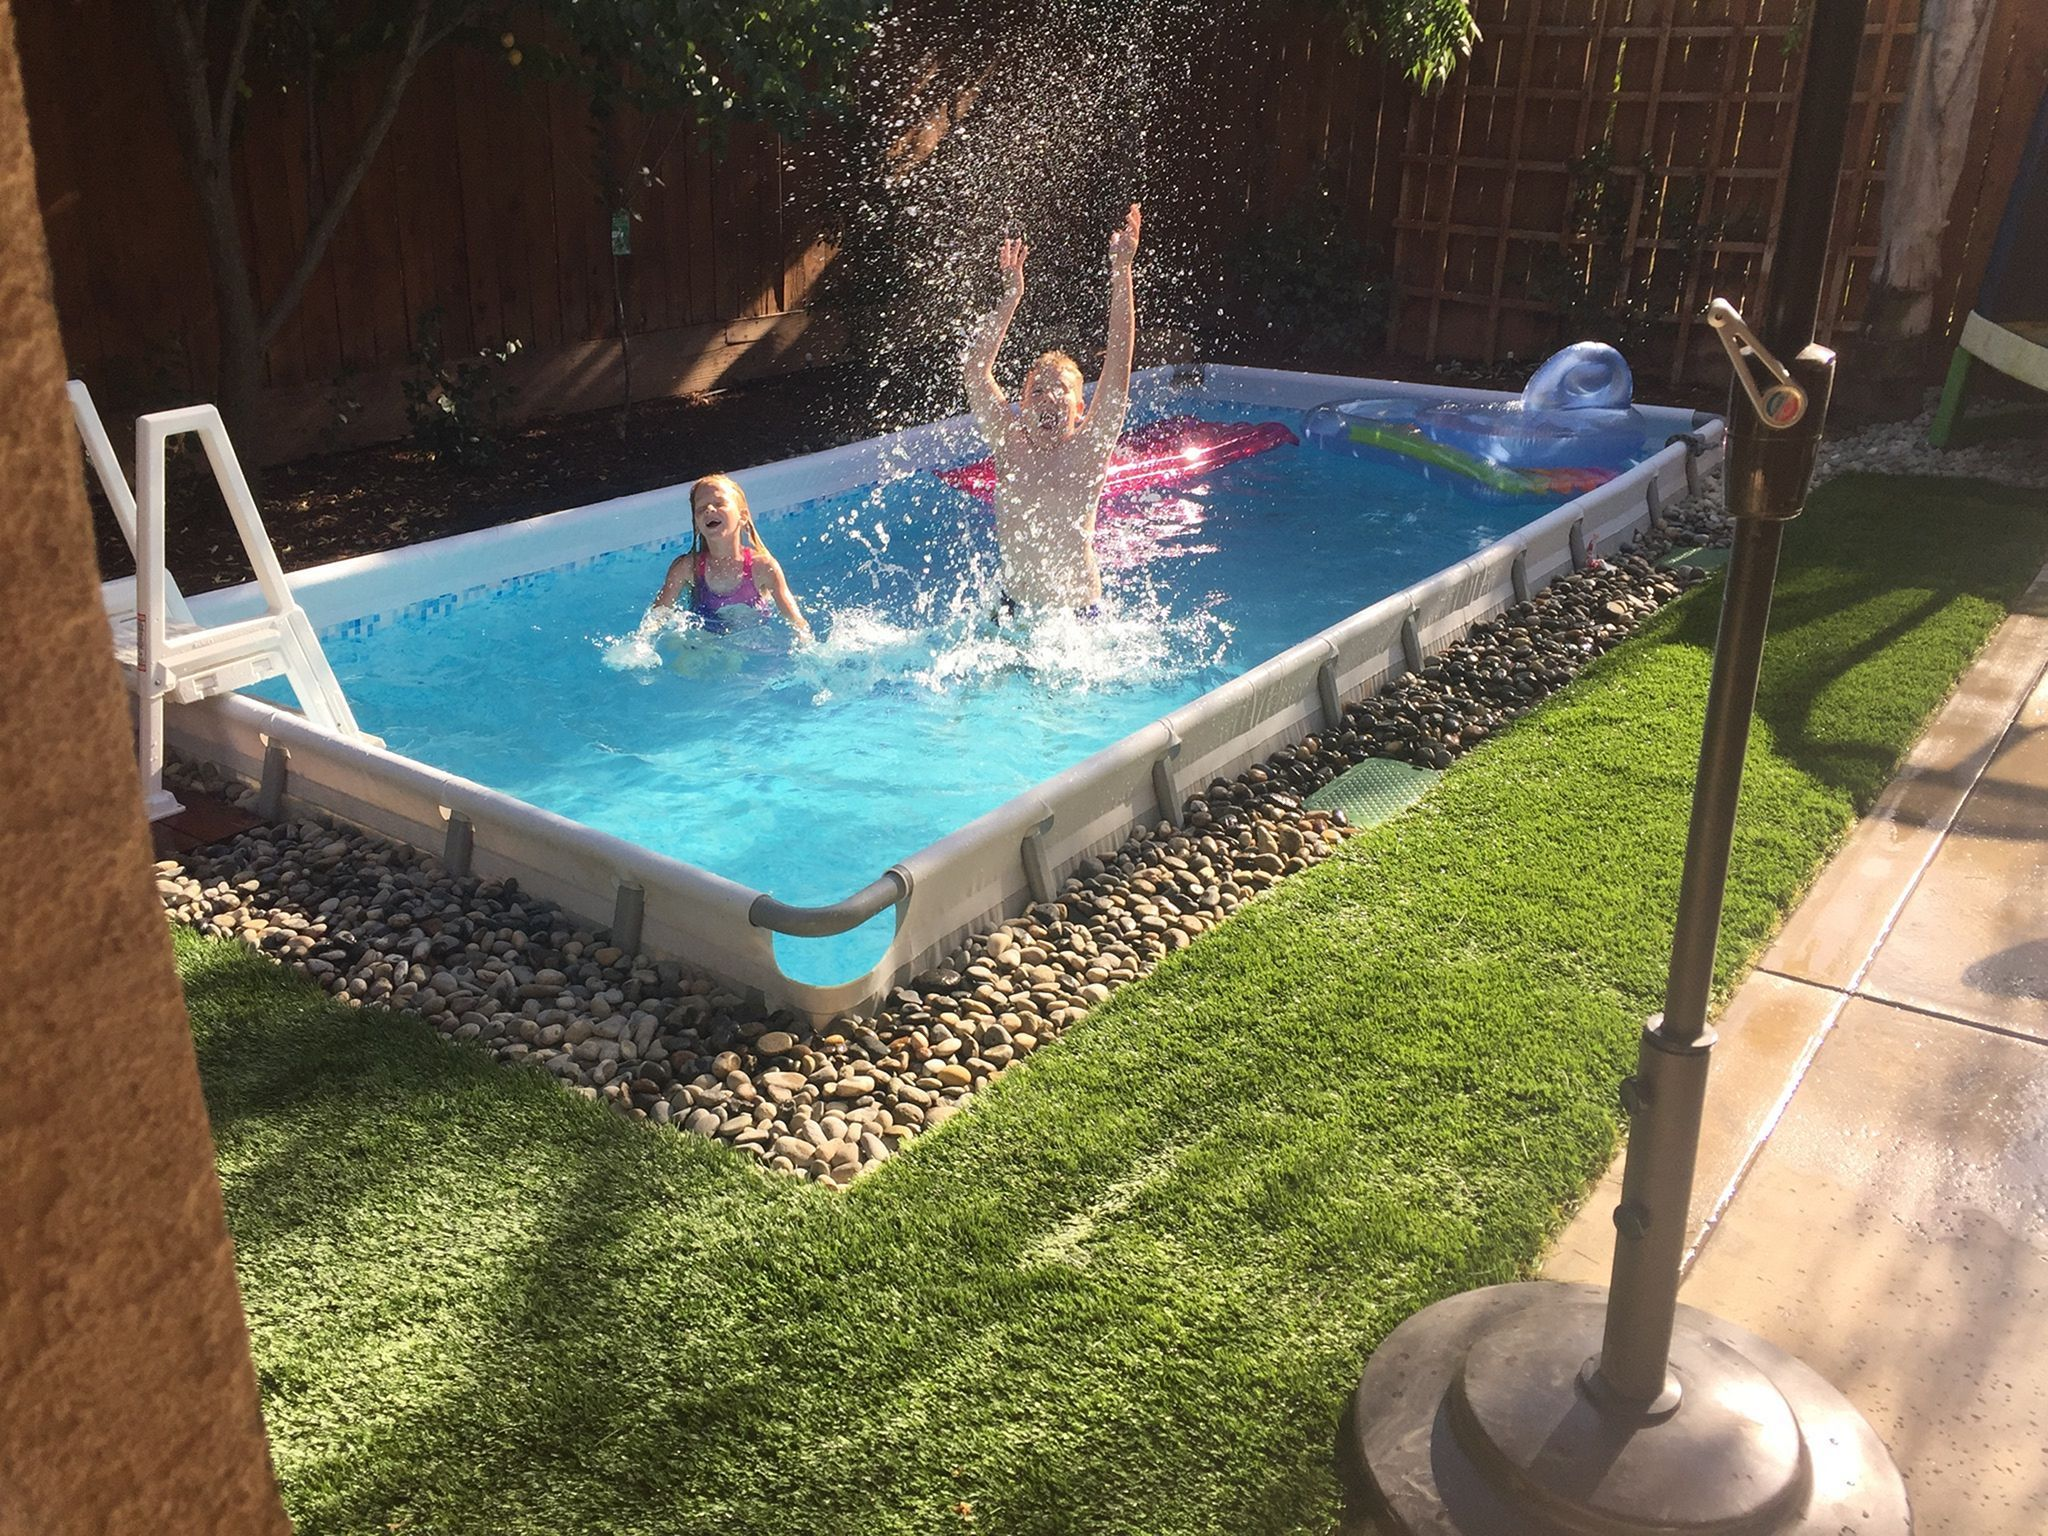 Swembad idee   Diy swimming pool, Pool designs